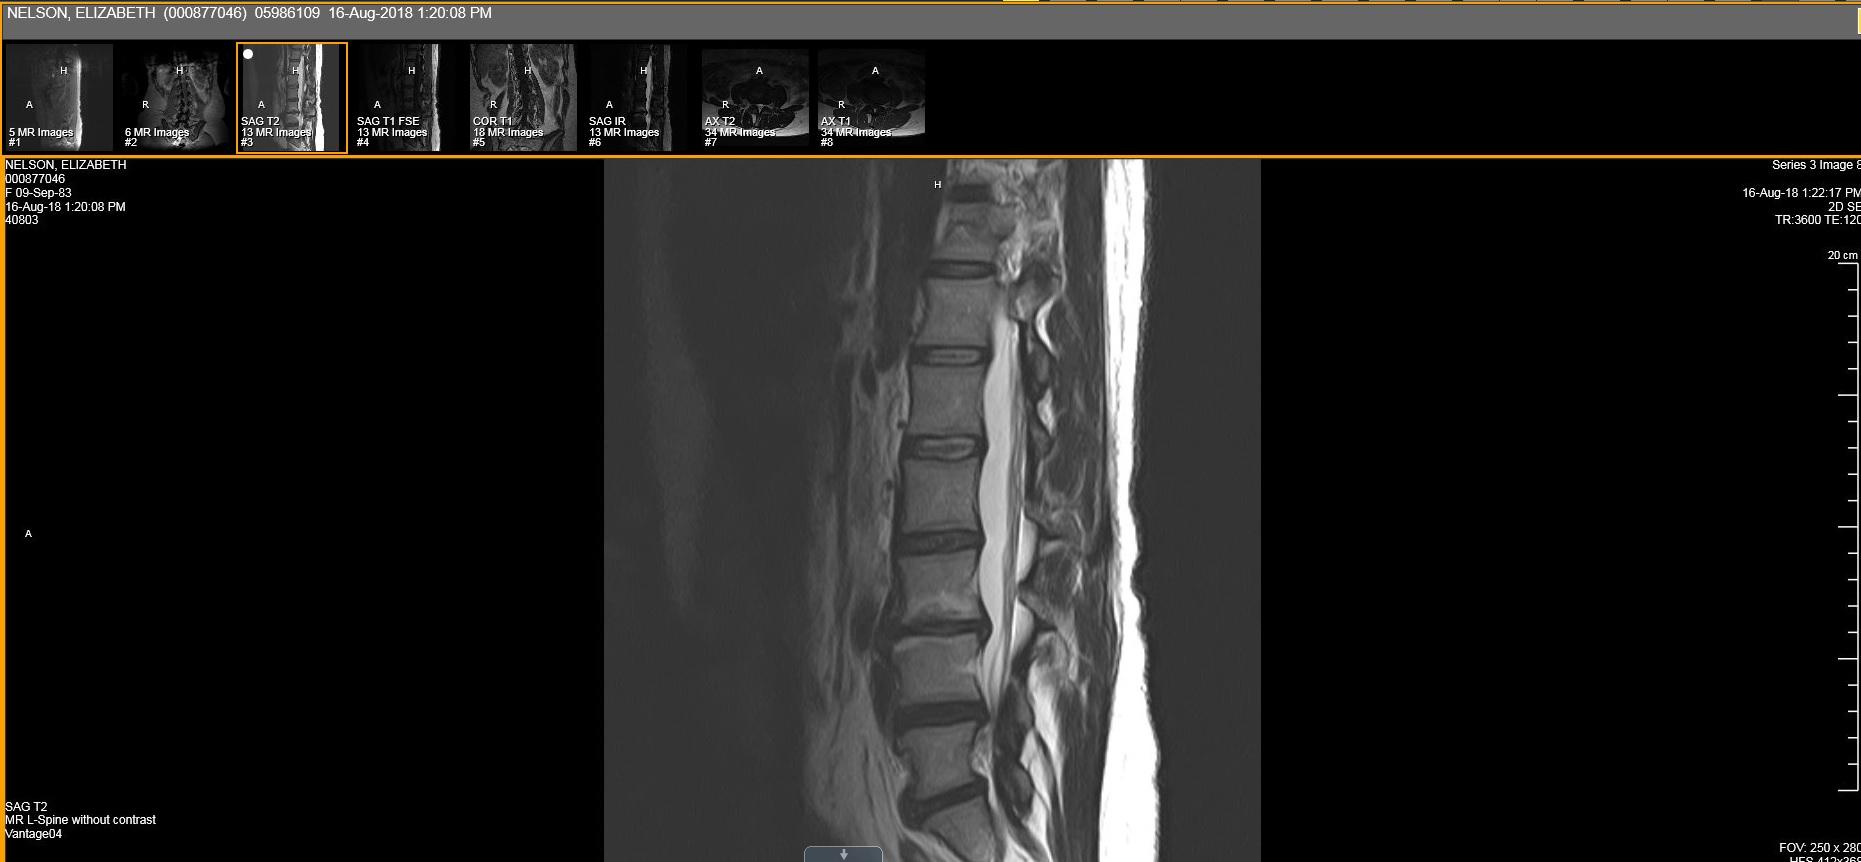 MRI August 2018